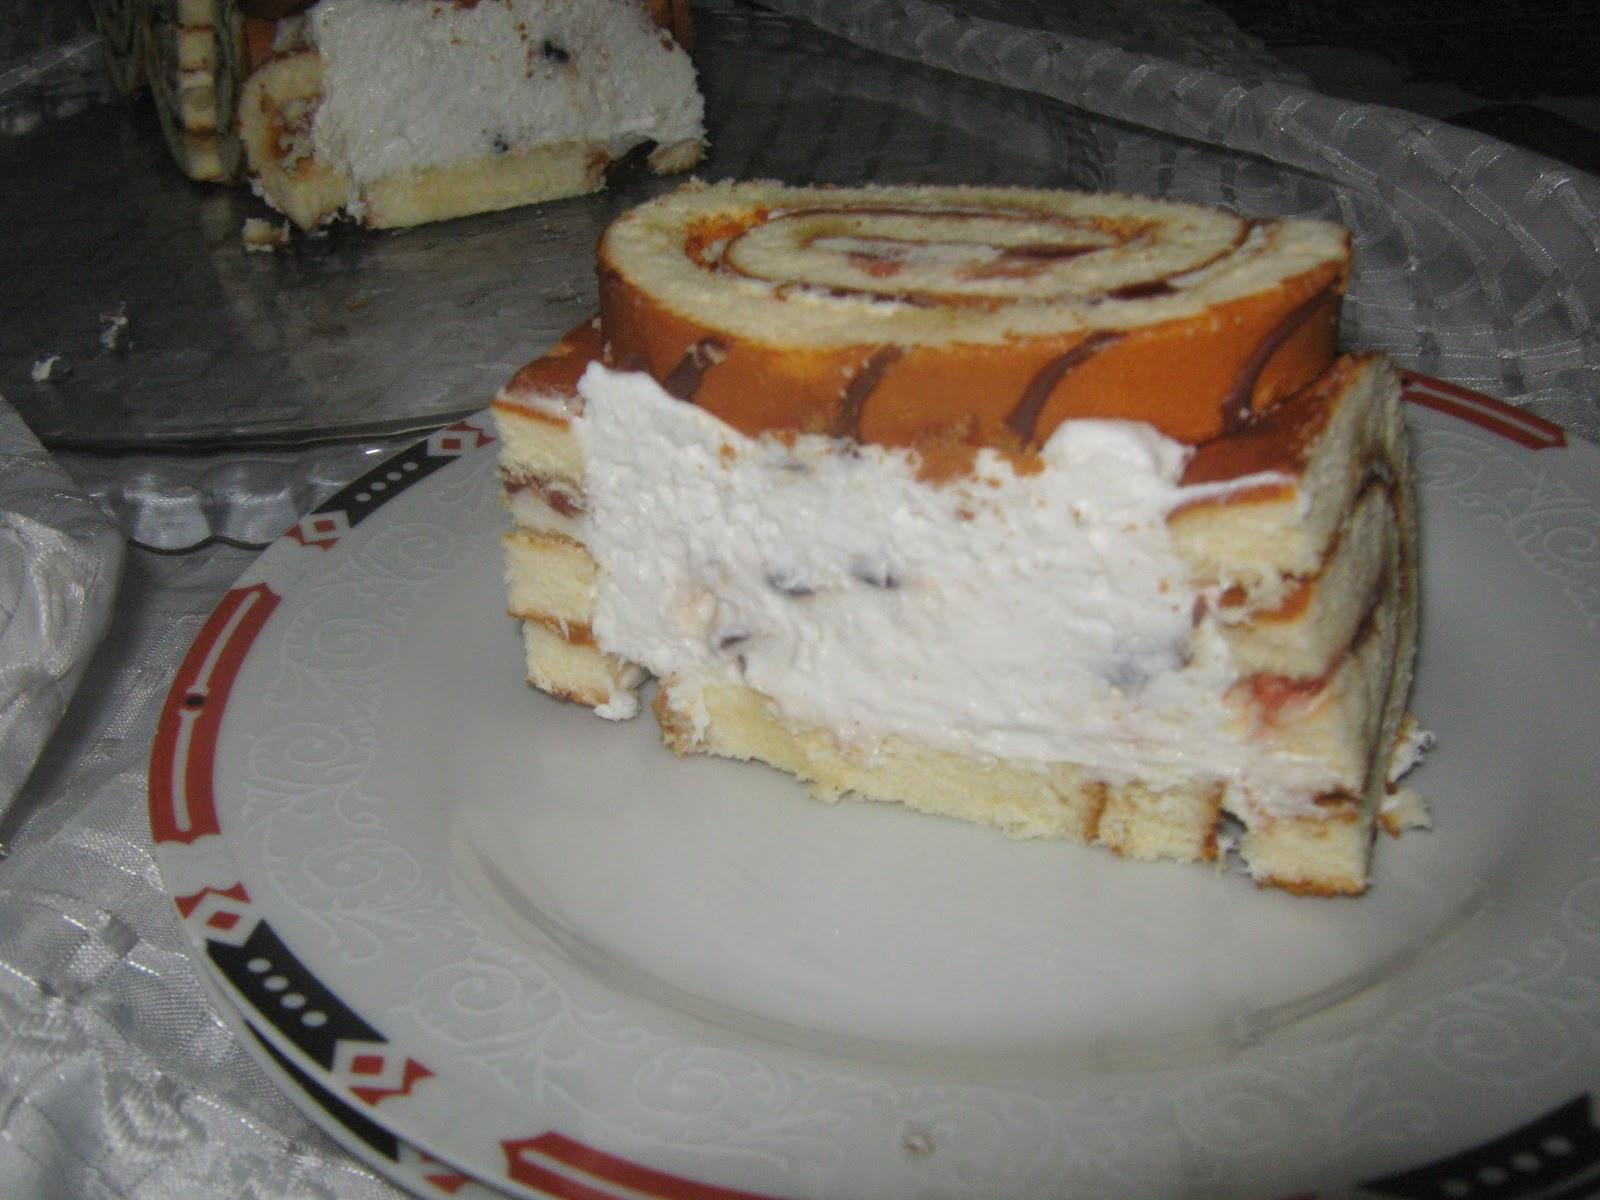 rulo pasta,pratik pasta,rulo kekli pasta,krem şantili pasta,pasta,şarlot pasta